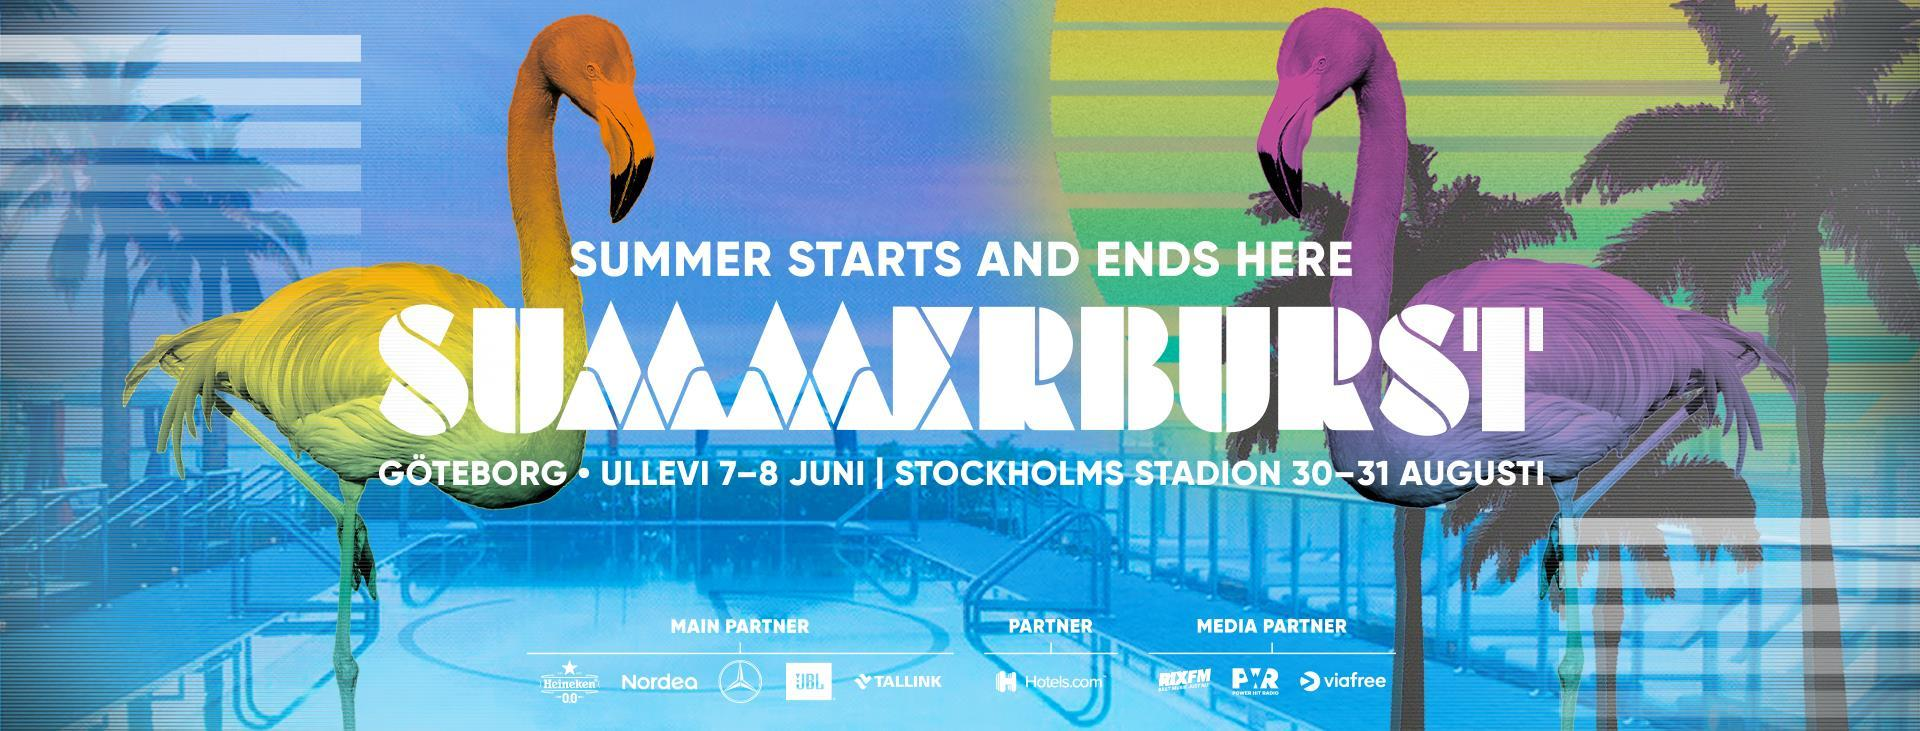 Swedish Music Festivals 2019